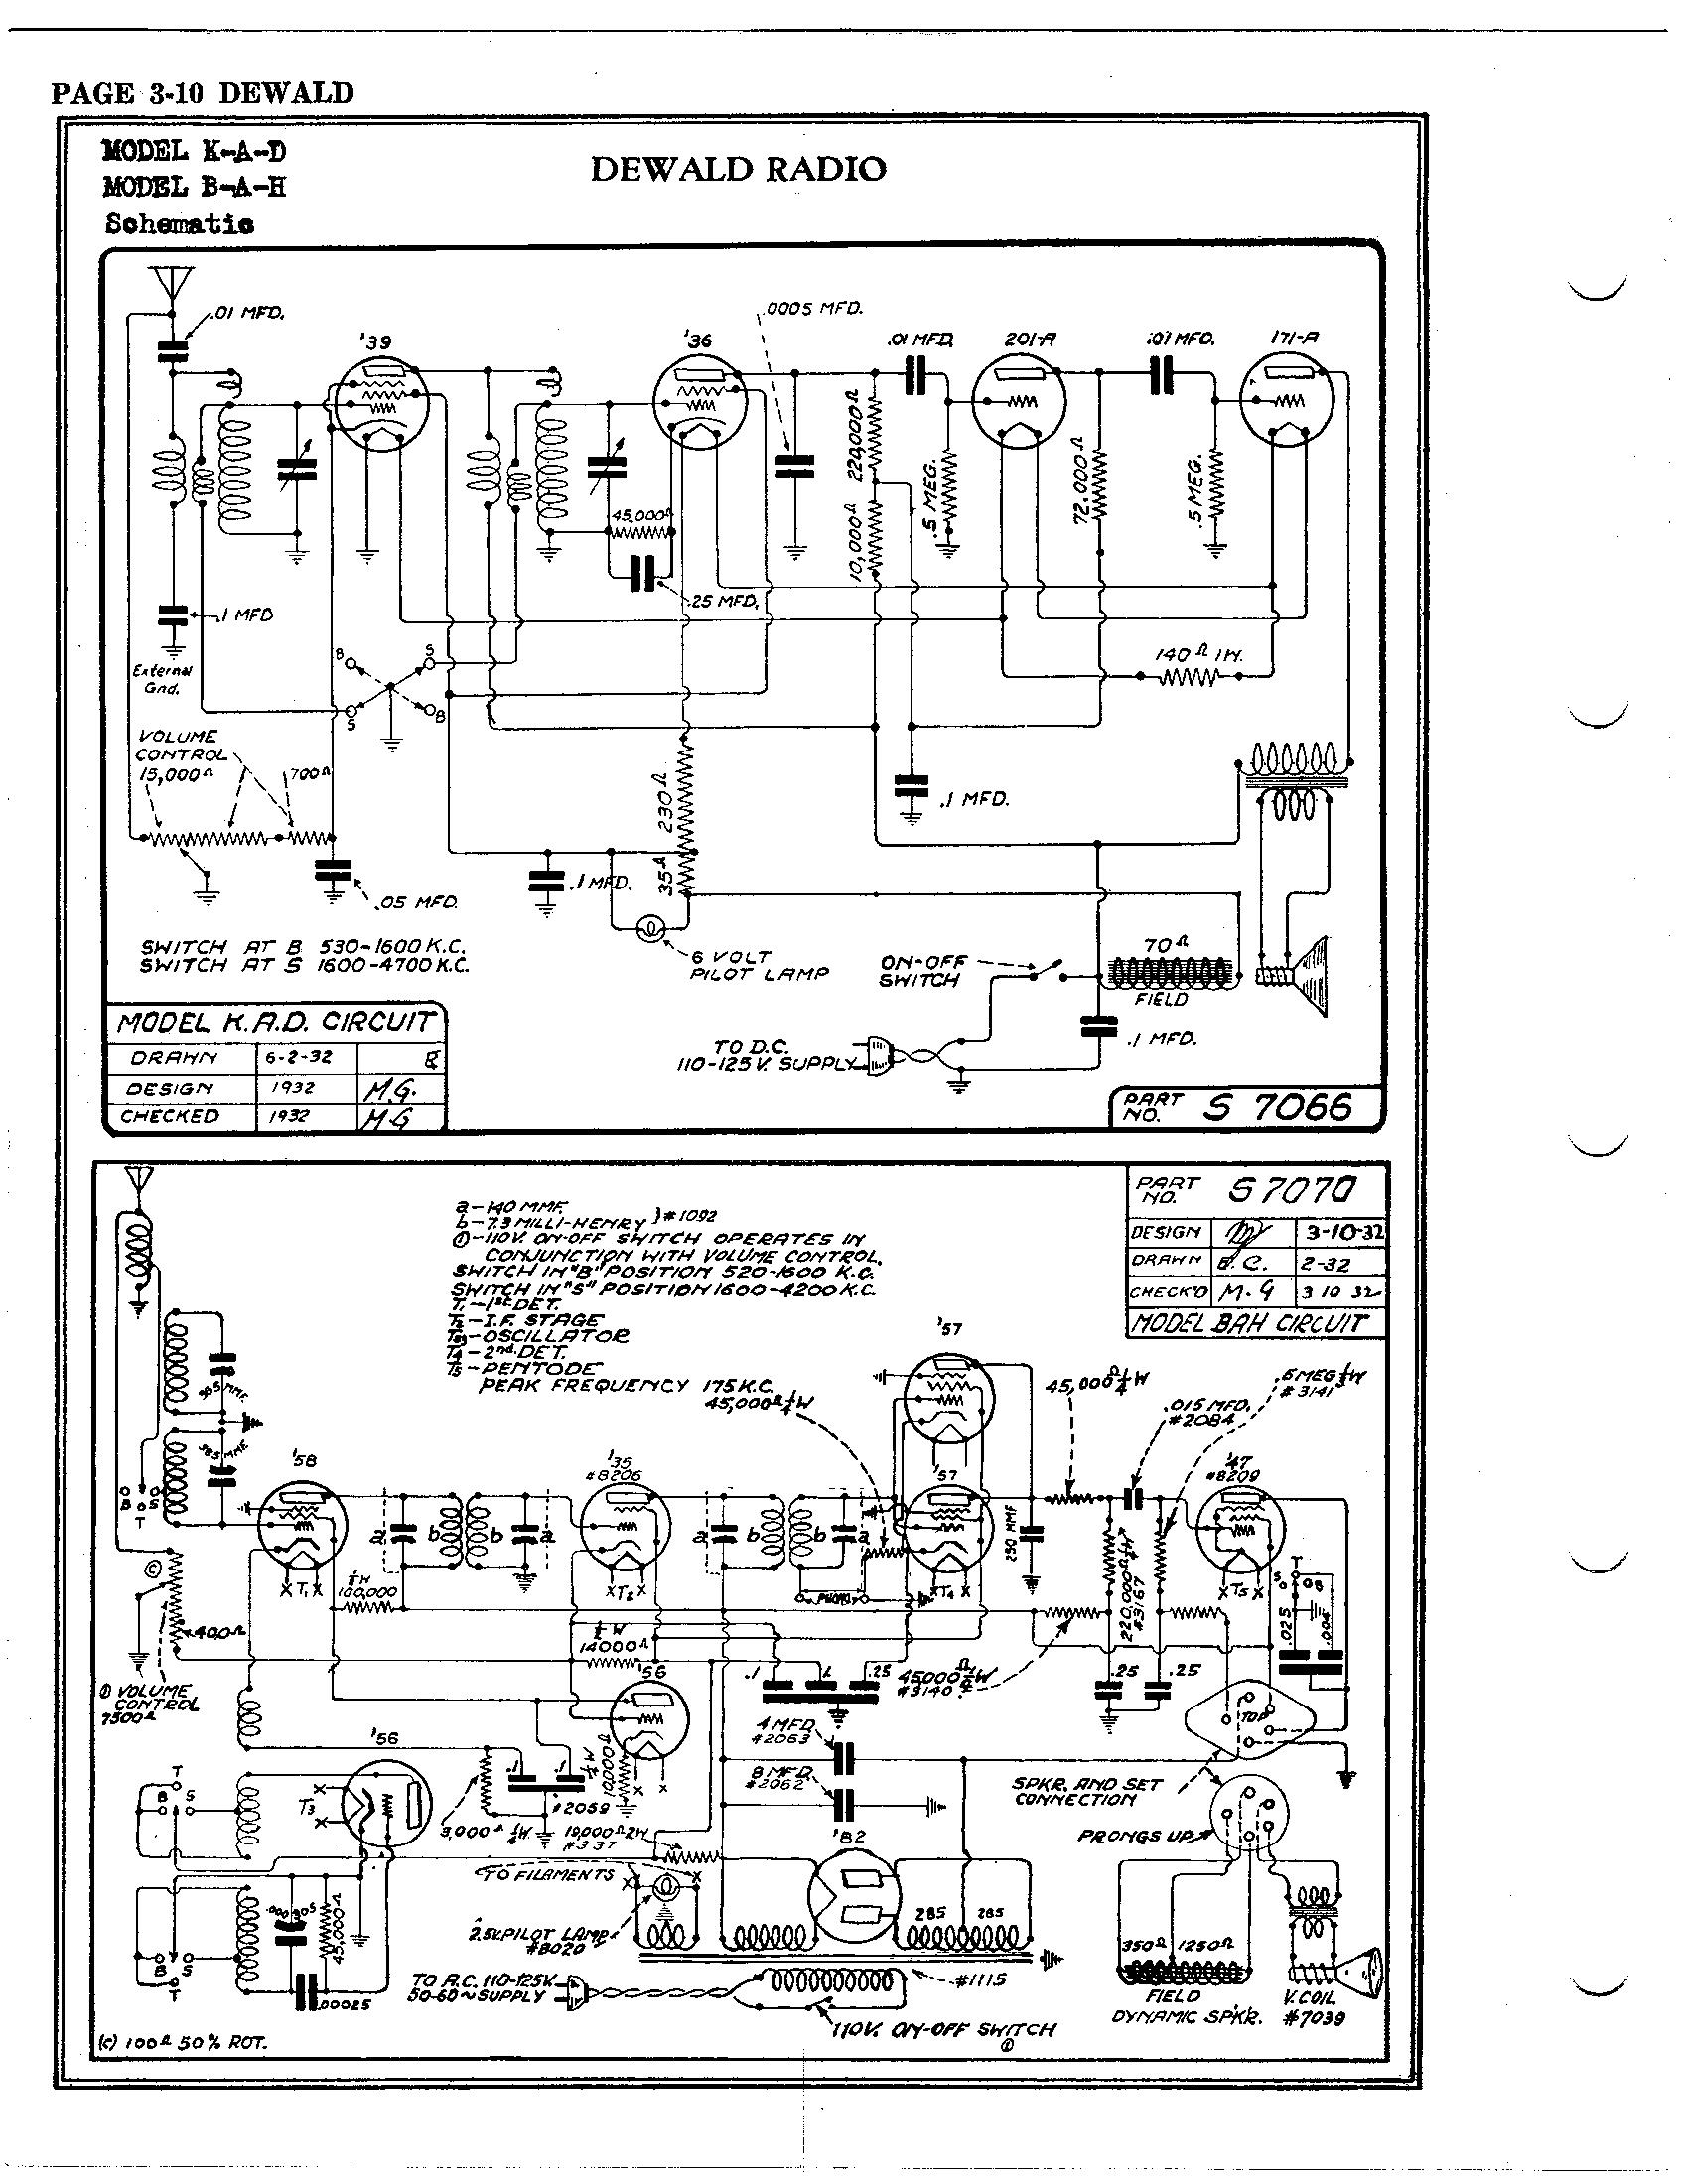 dewald radio mfg  corp  b